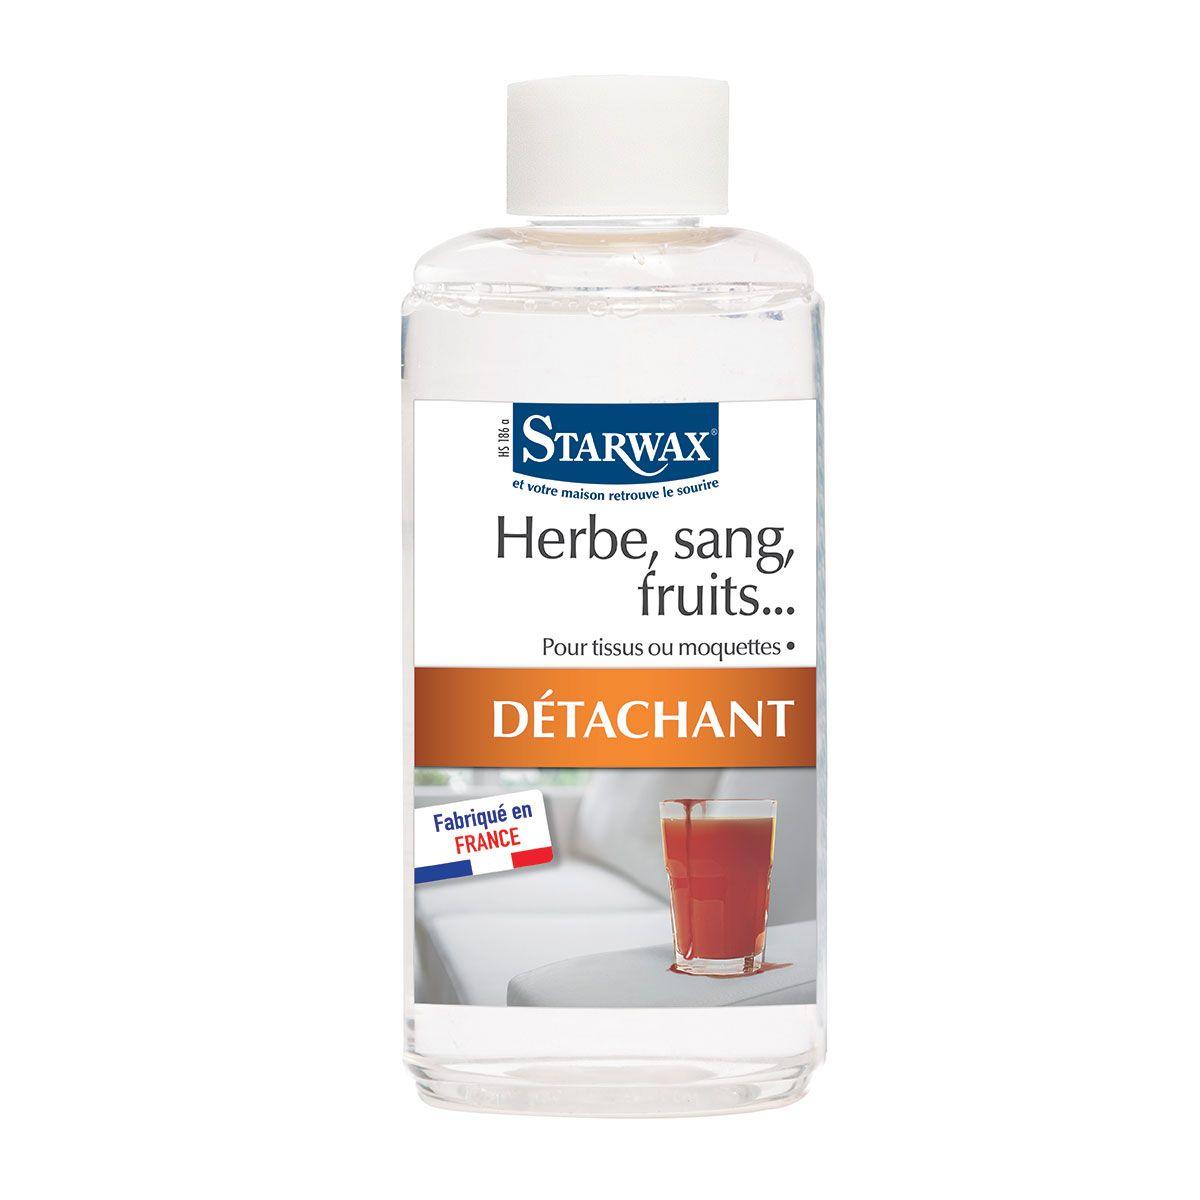 Detachant taches biologiques - Starwax